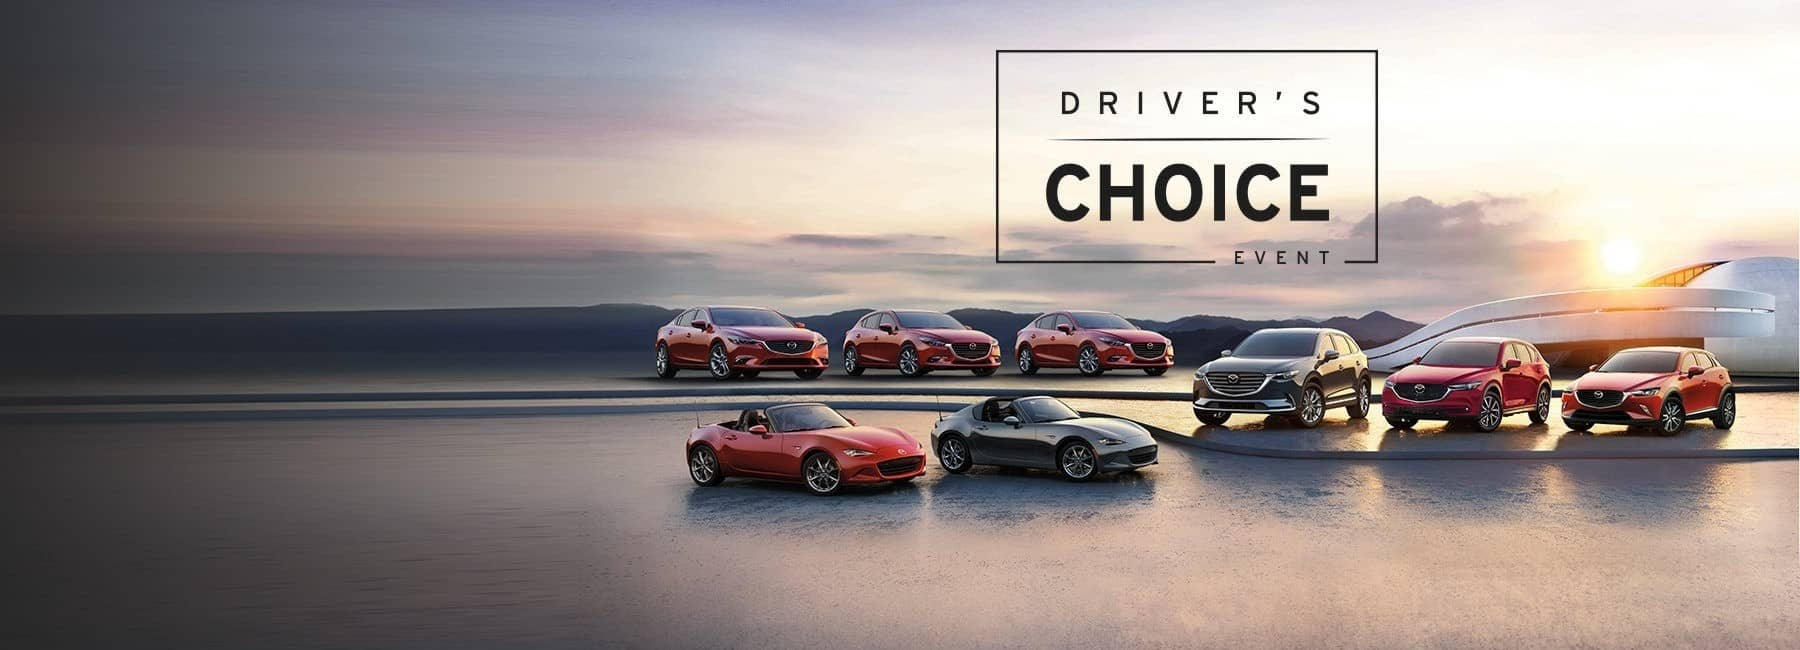 BIGMAZ_SL_0815_1800x650_Drivers-Choice